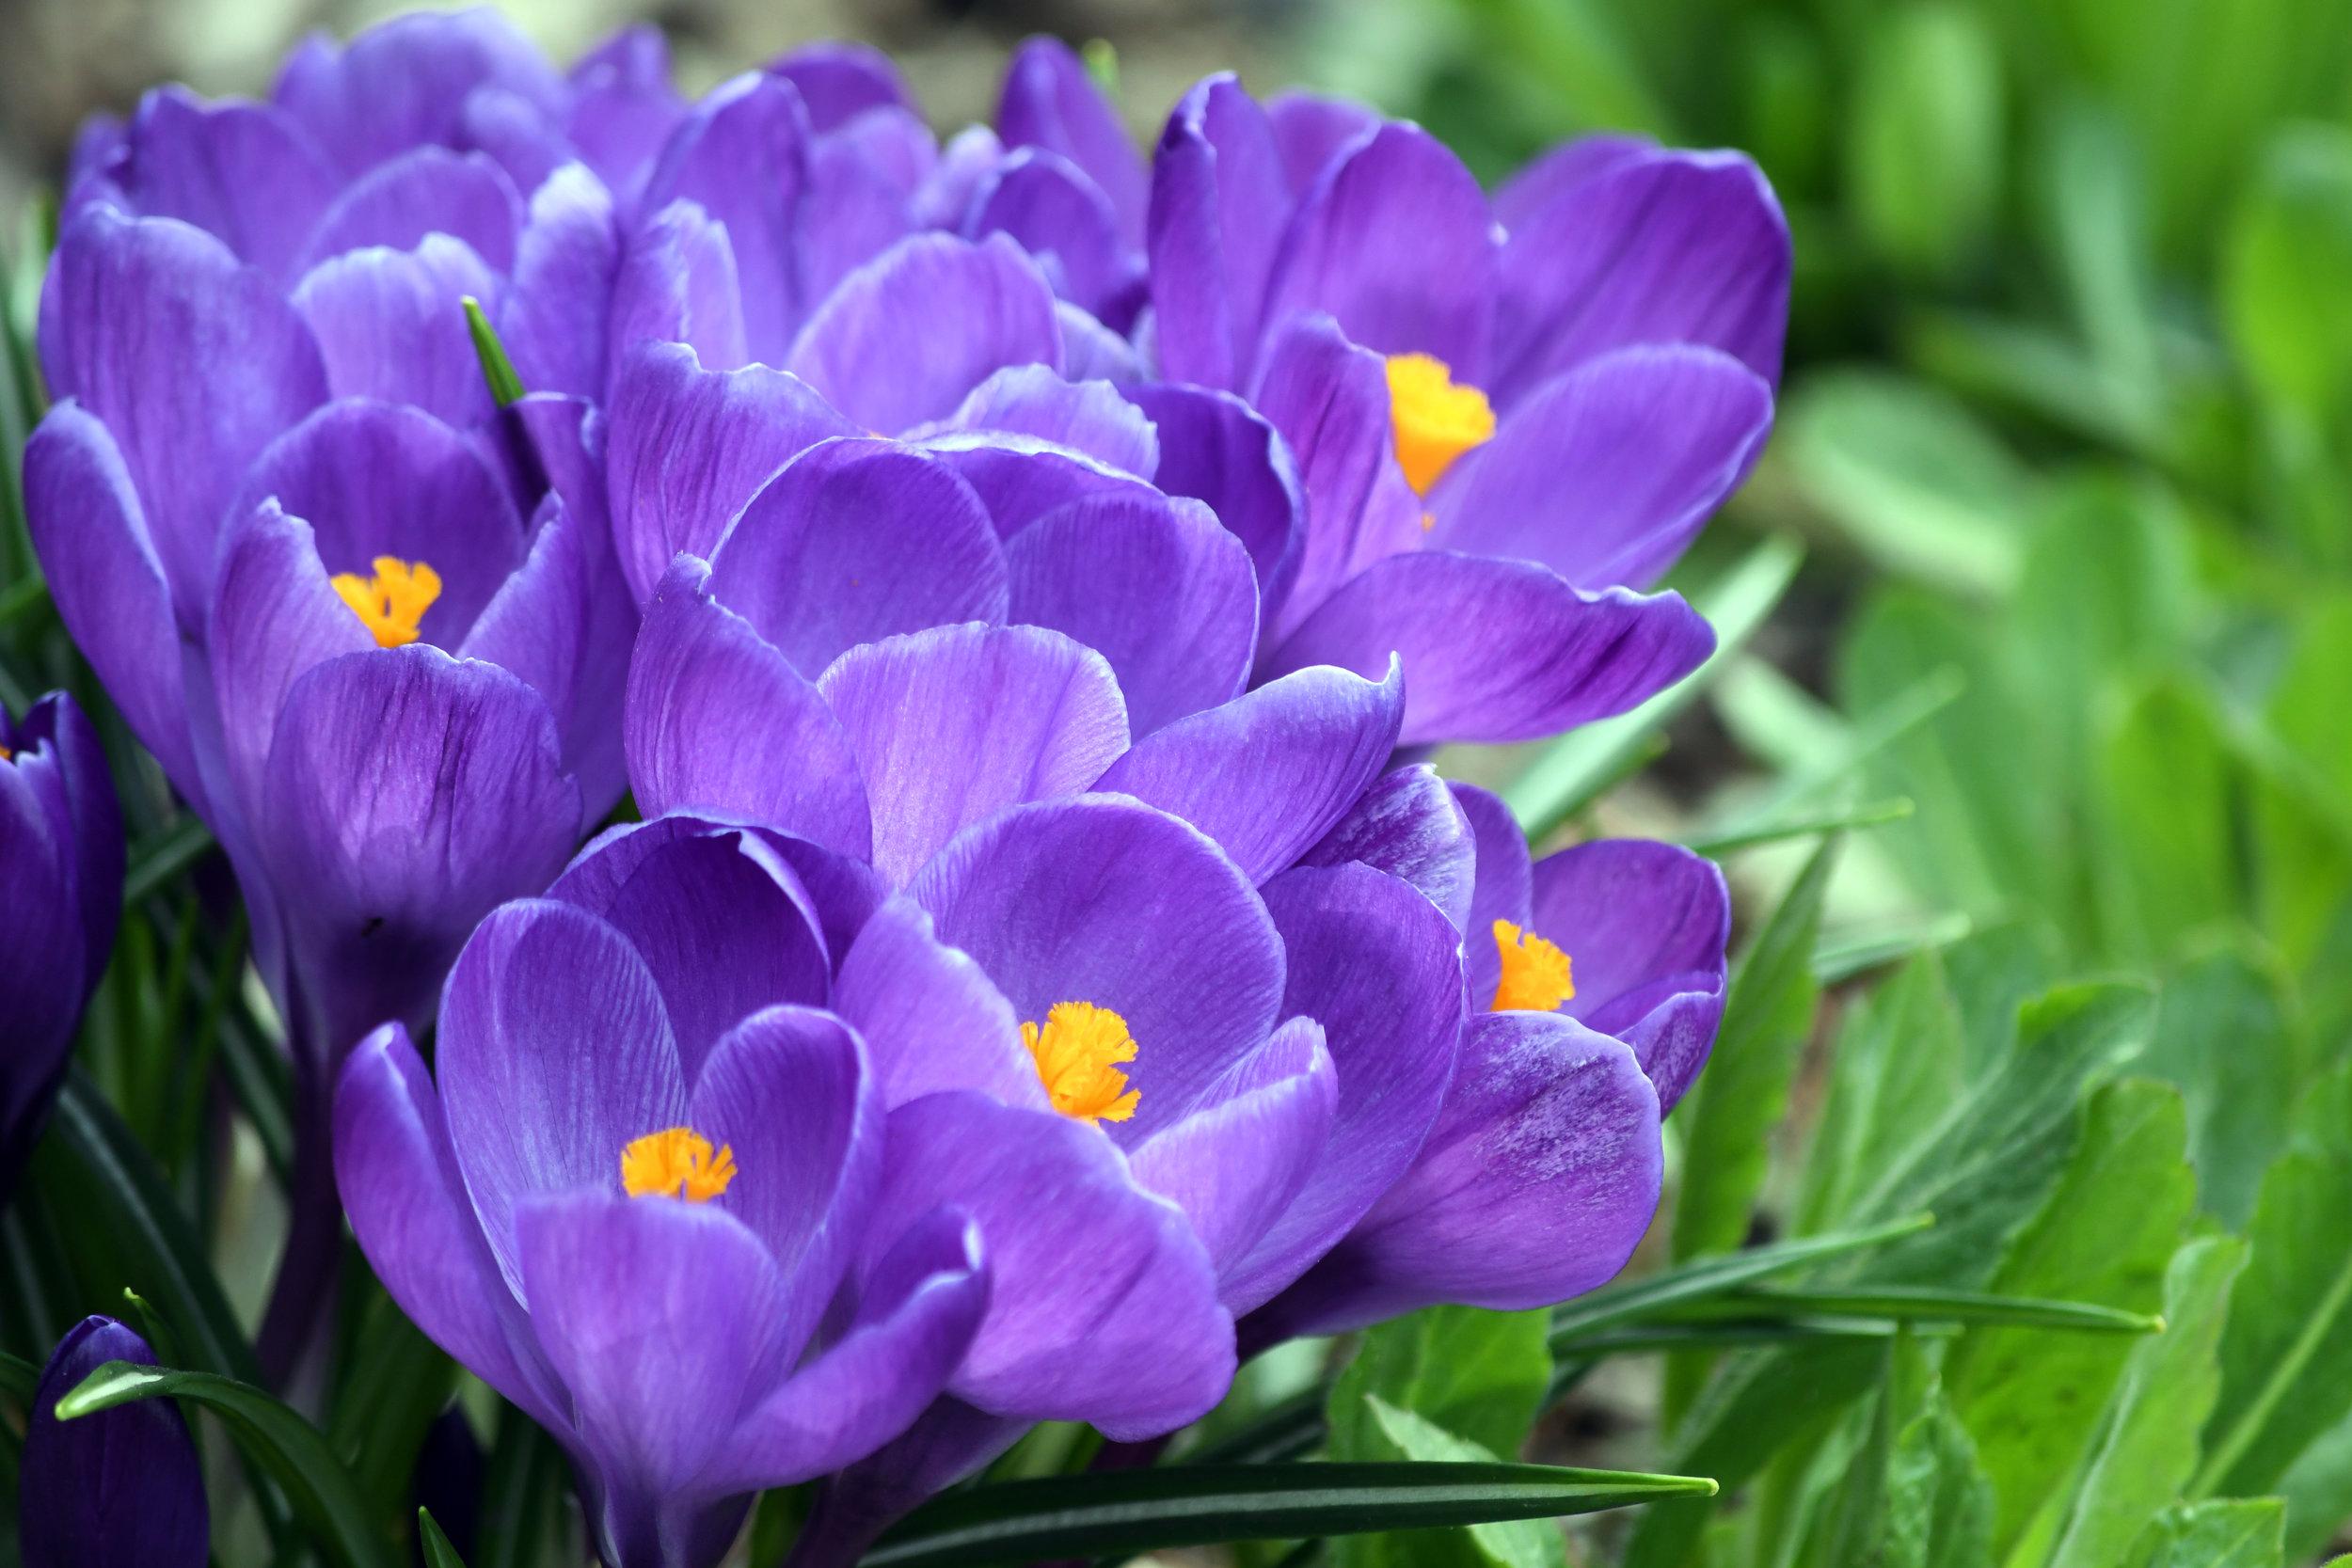 crocus flower south london club